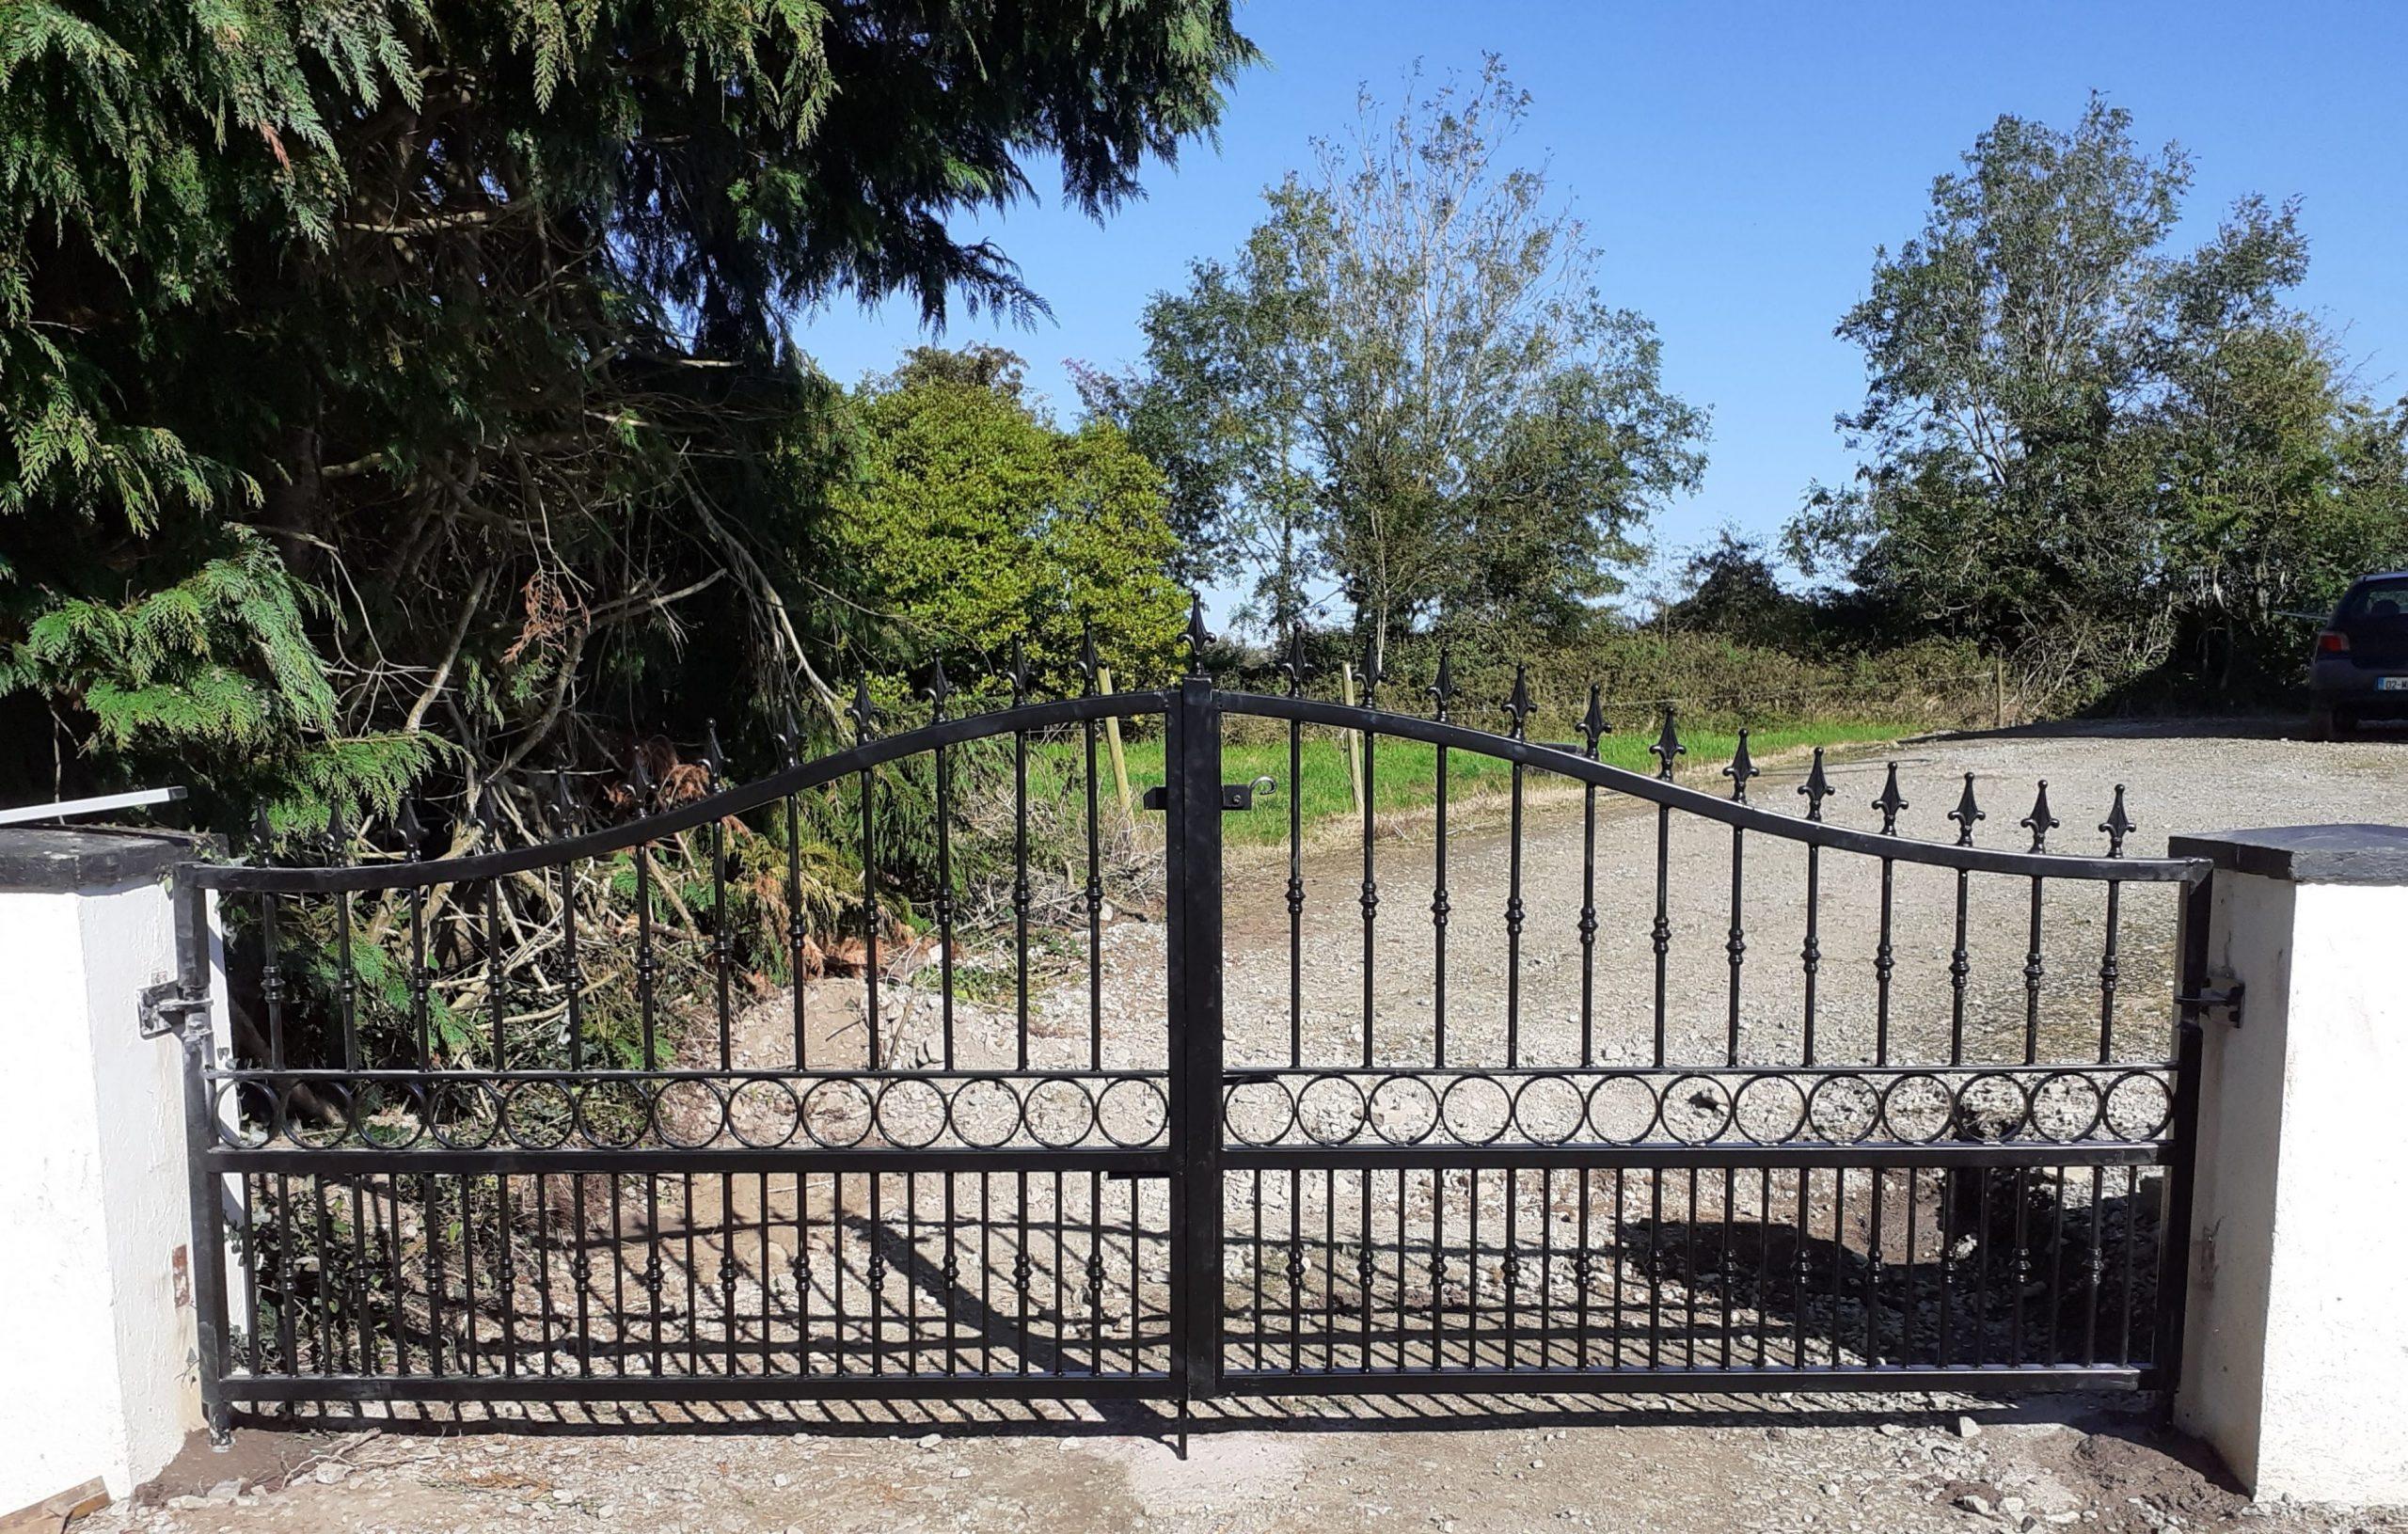 Entrance Gates, Wrought Iron Entrance Gates, Gates